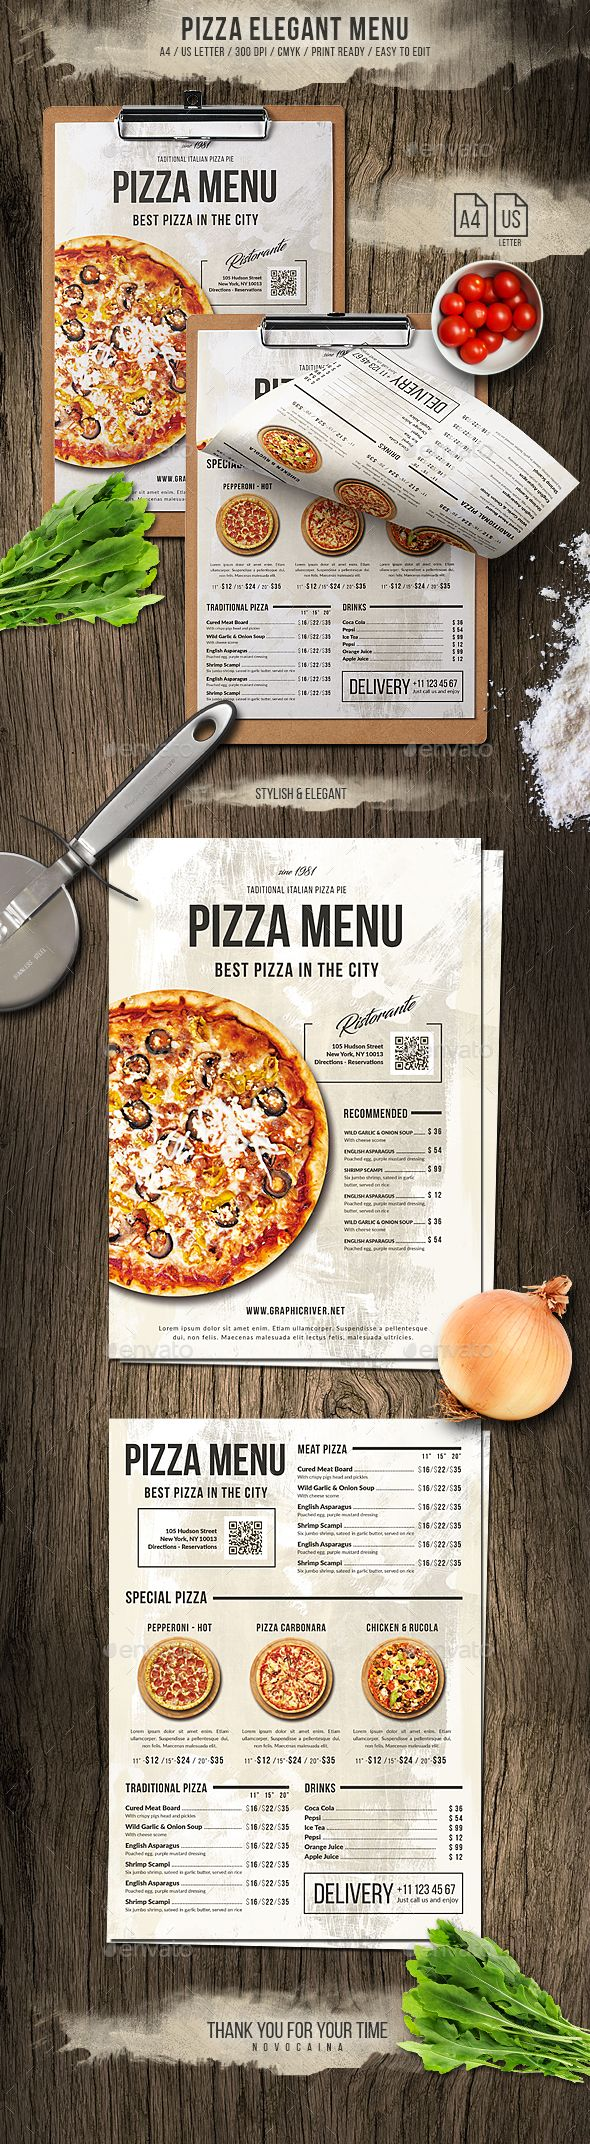 Pizza Elegant Menu - A4 and US Letter | Pinterest | Restaurantes ...